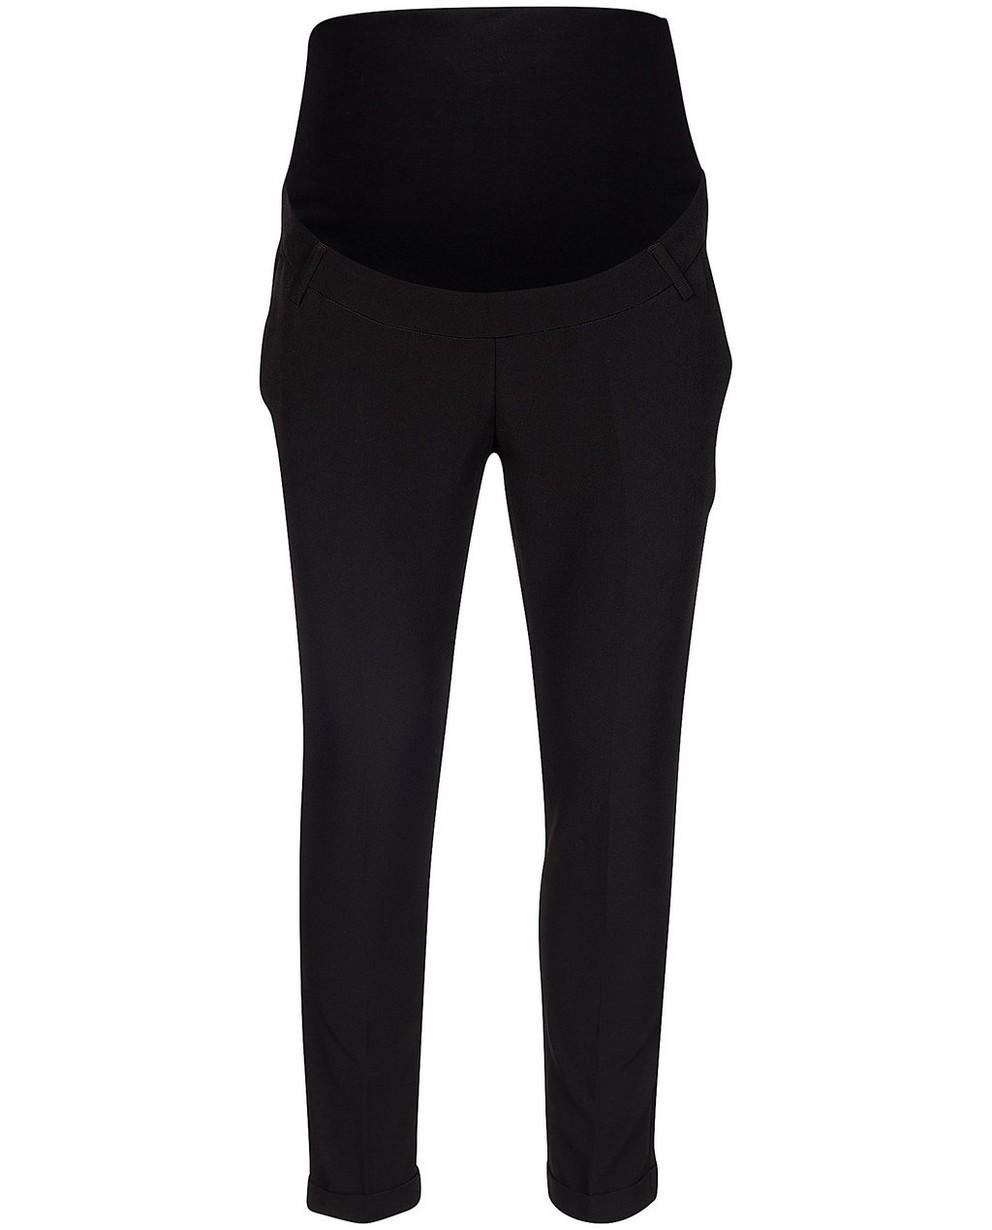 Pantalon habillé JoliRonde - grossesse - Joli Ronde